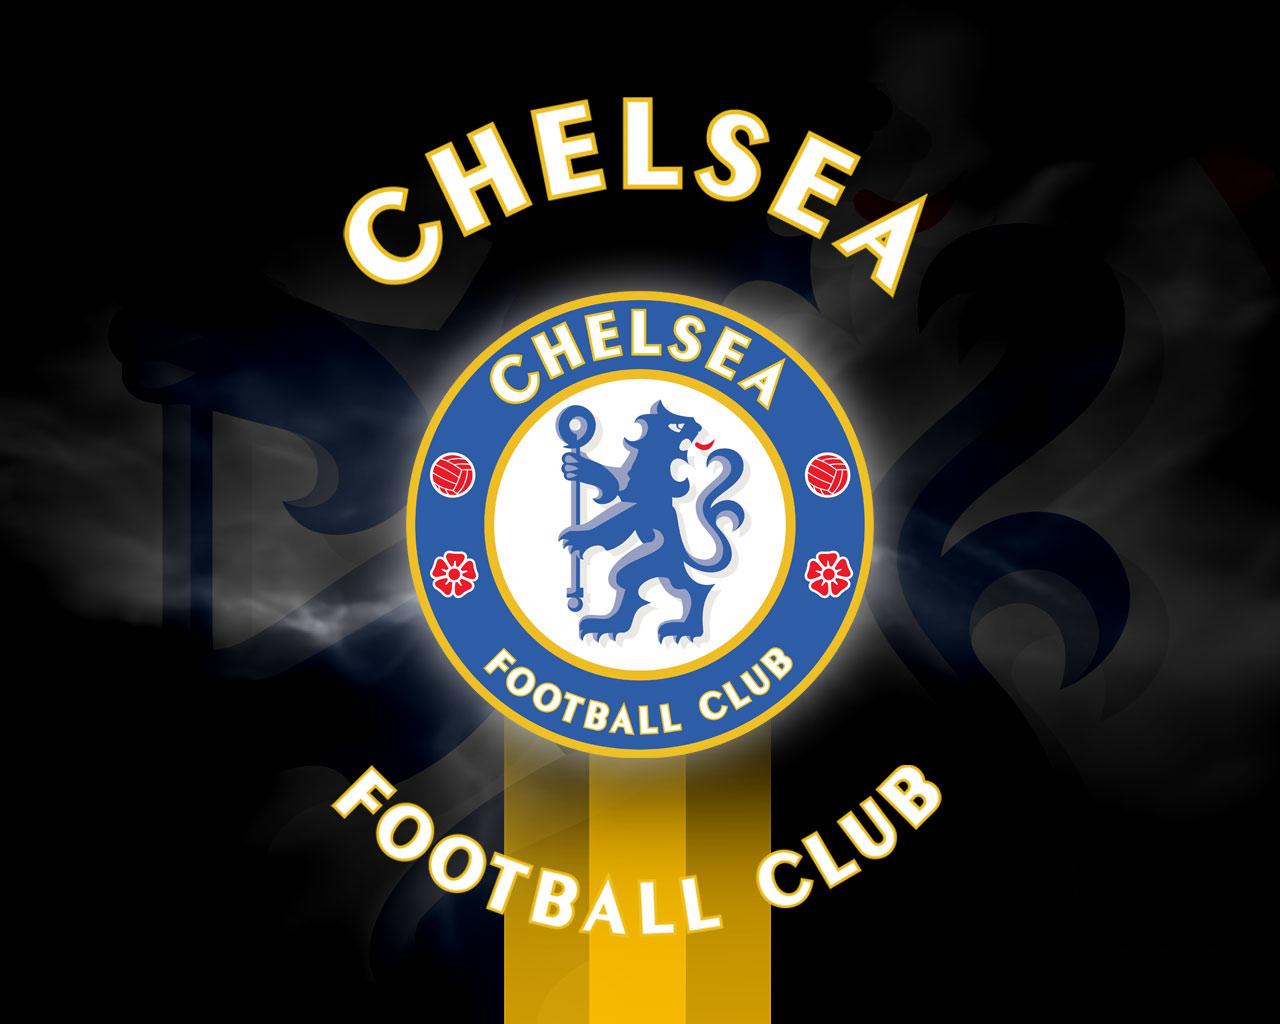 England Football Logos Chelsea Logo Pictures 1280x1024